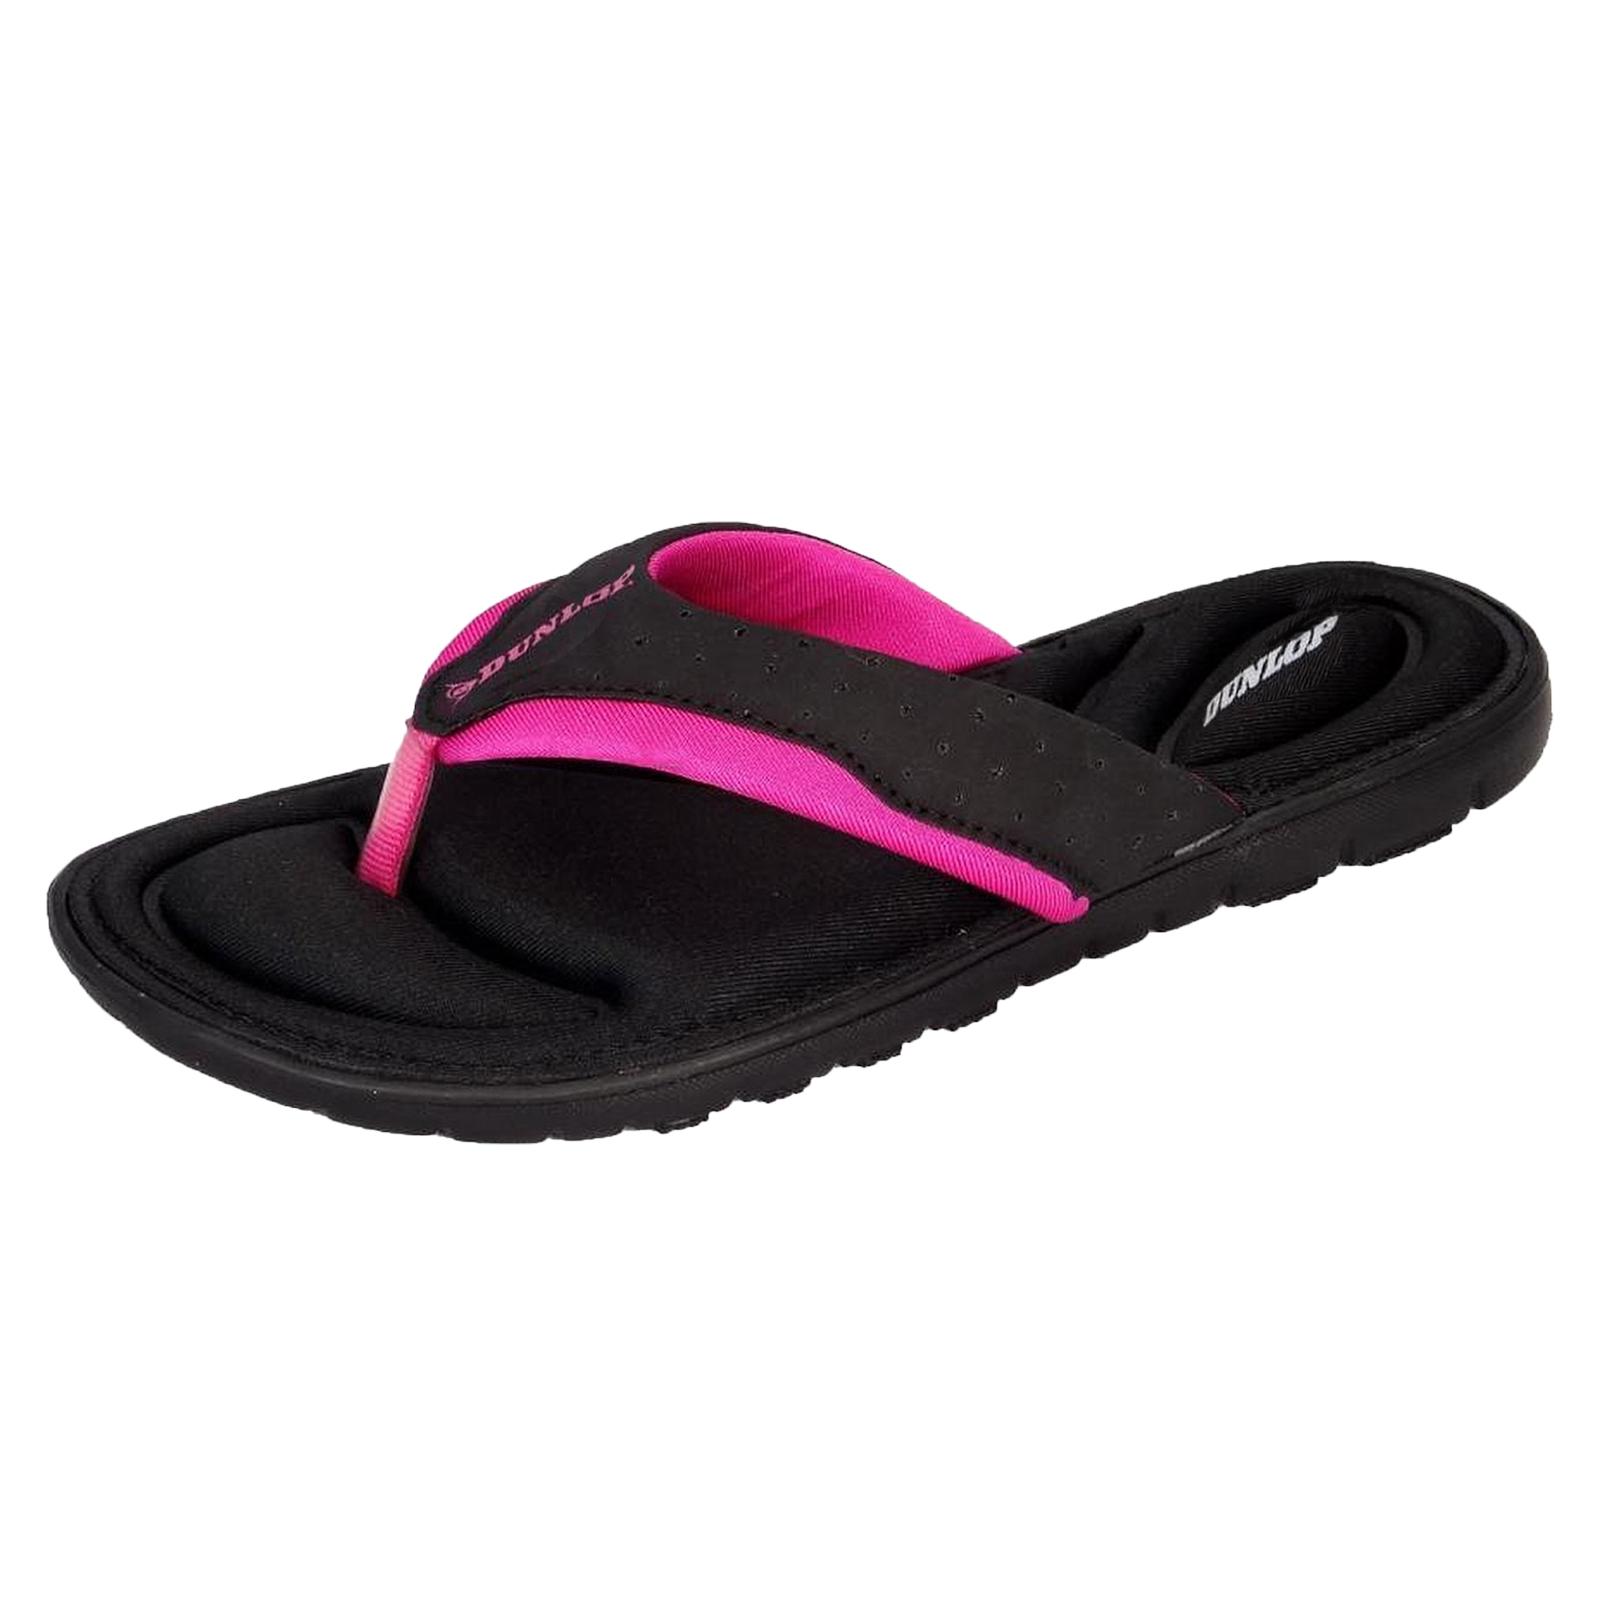 883c9b0f0a06f Details about Dunlop Womens Designer Black Fuchsia Memory Foam Flip Flops  Toe Post Sandals